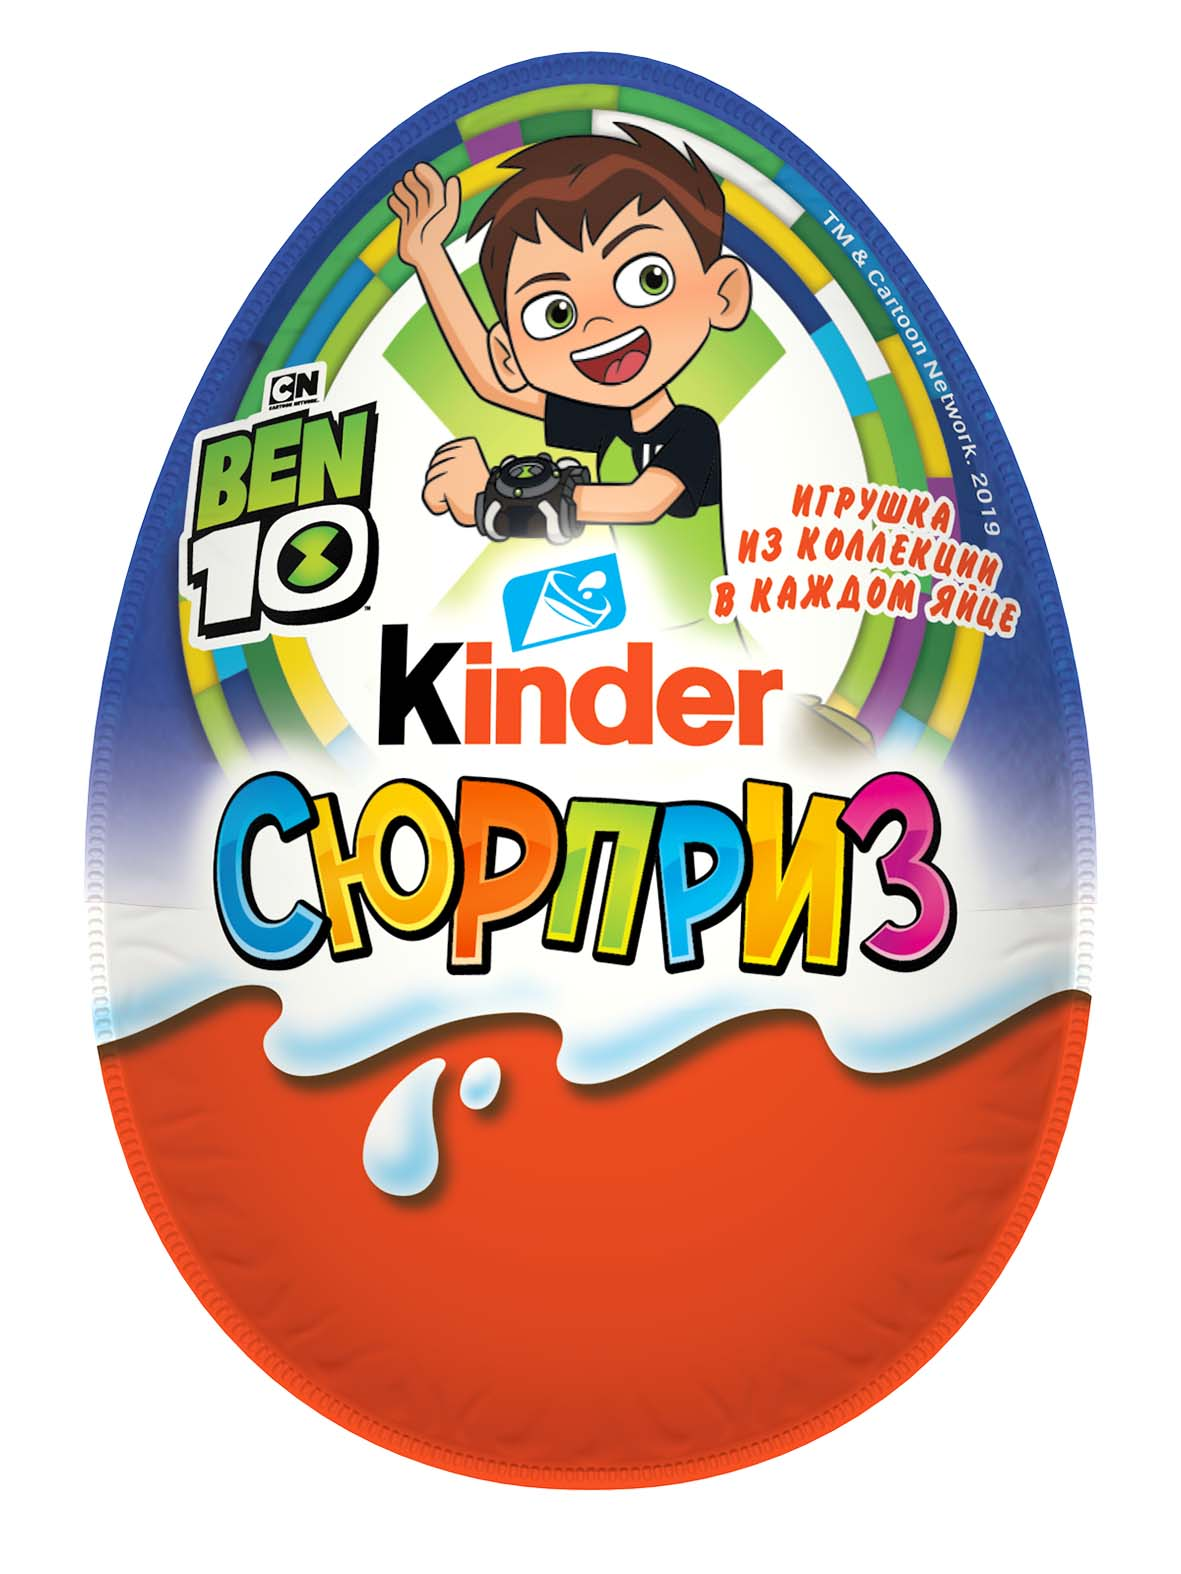 киндер конфета kinder chocolate maxi kinder Киндер Яйцо шоколадное Kinder Surprise